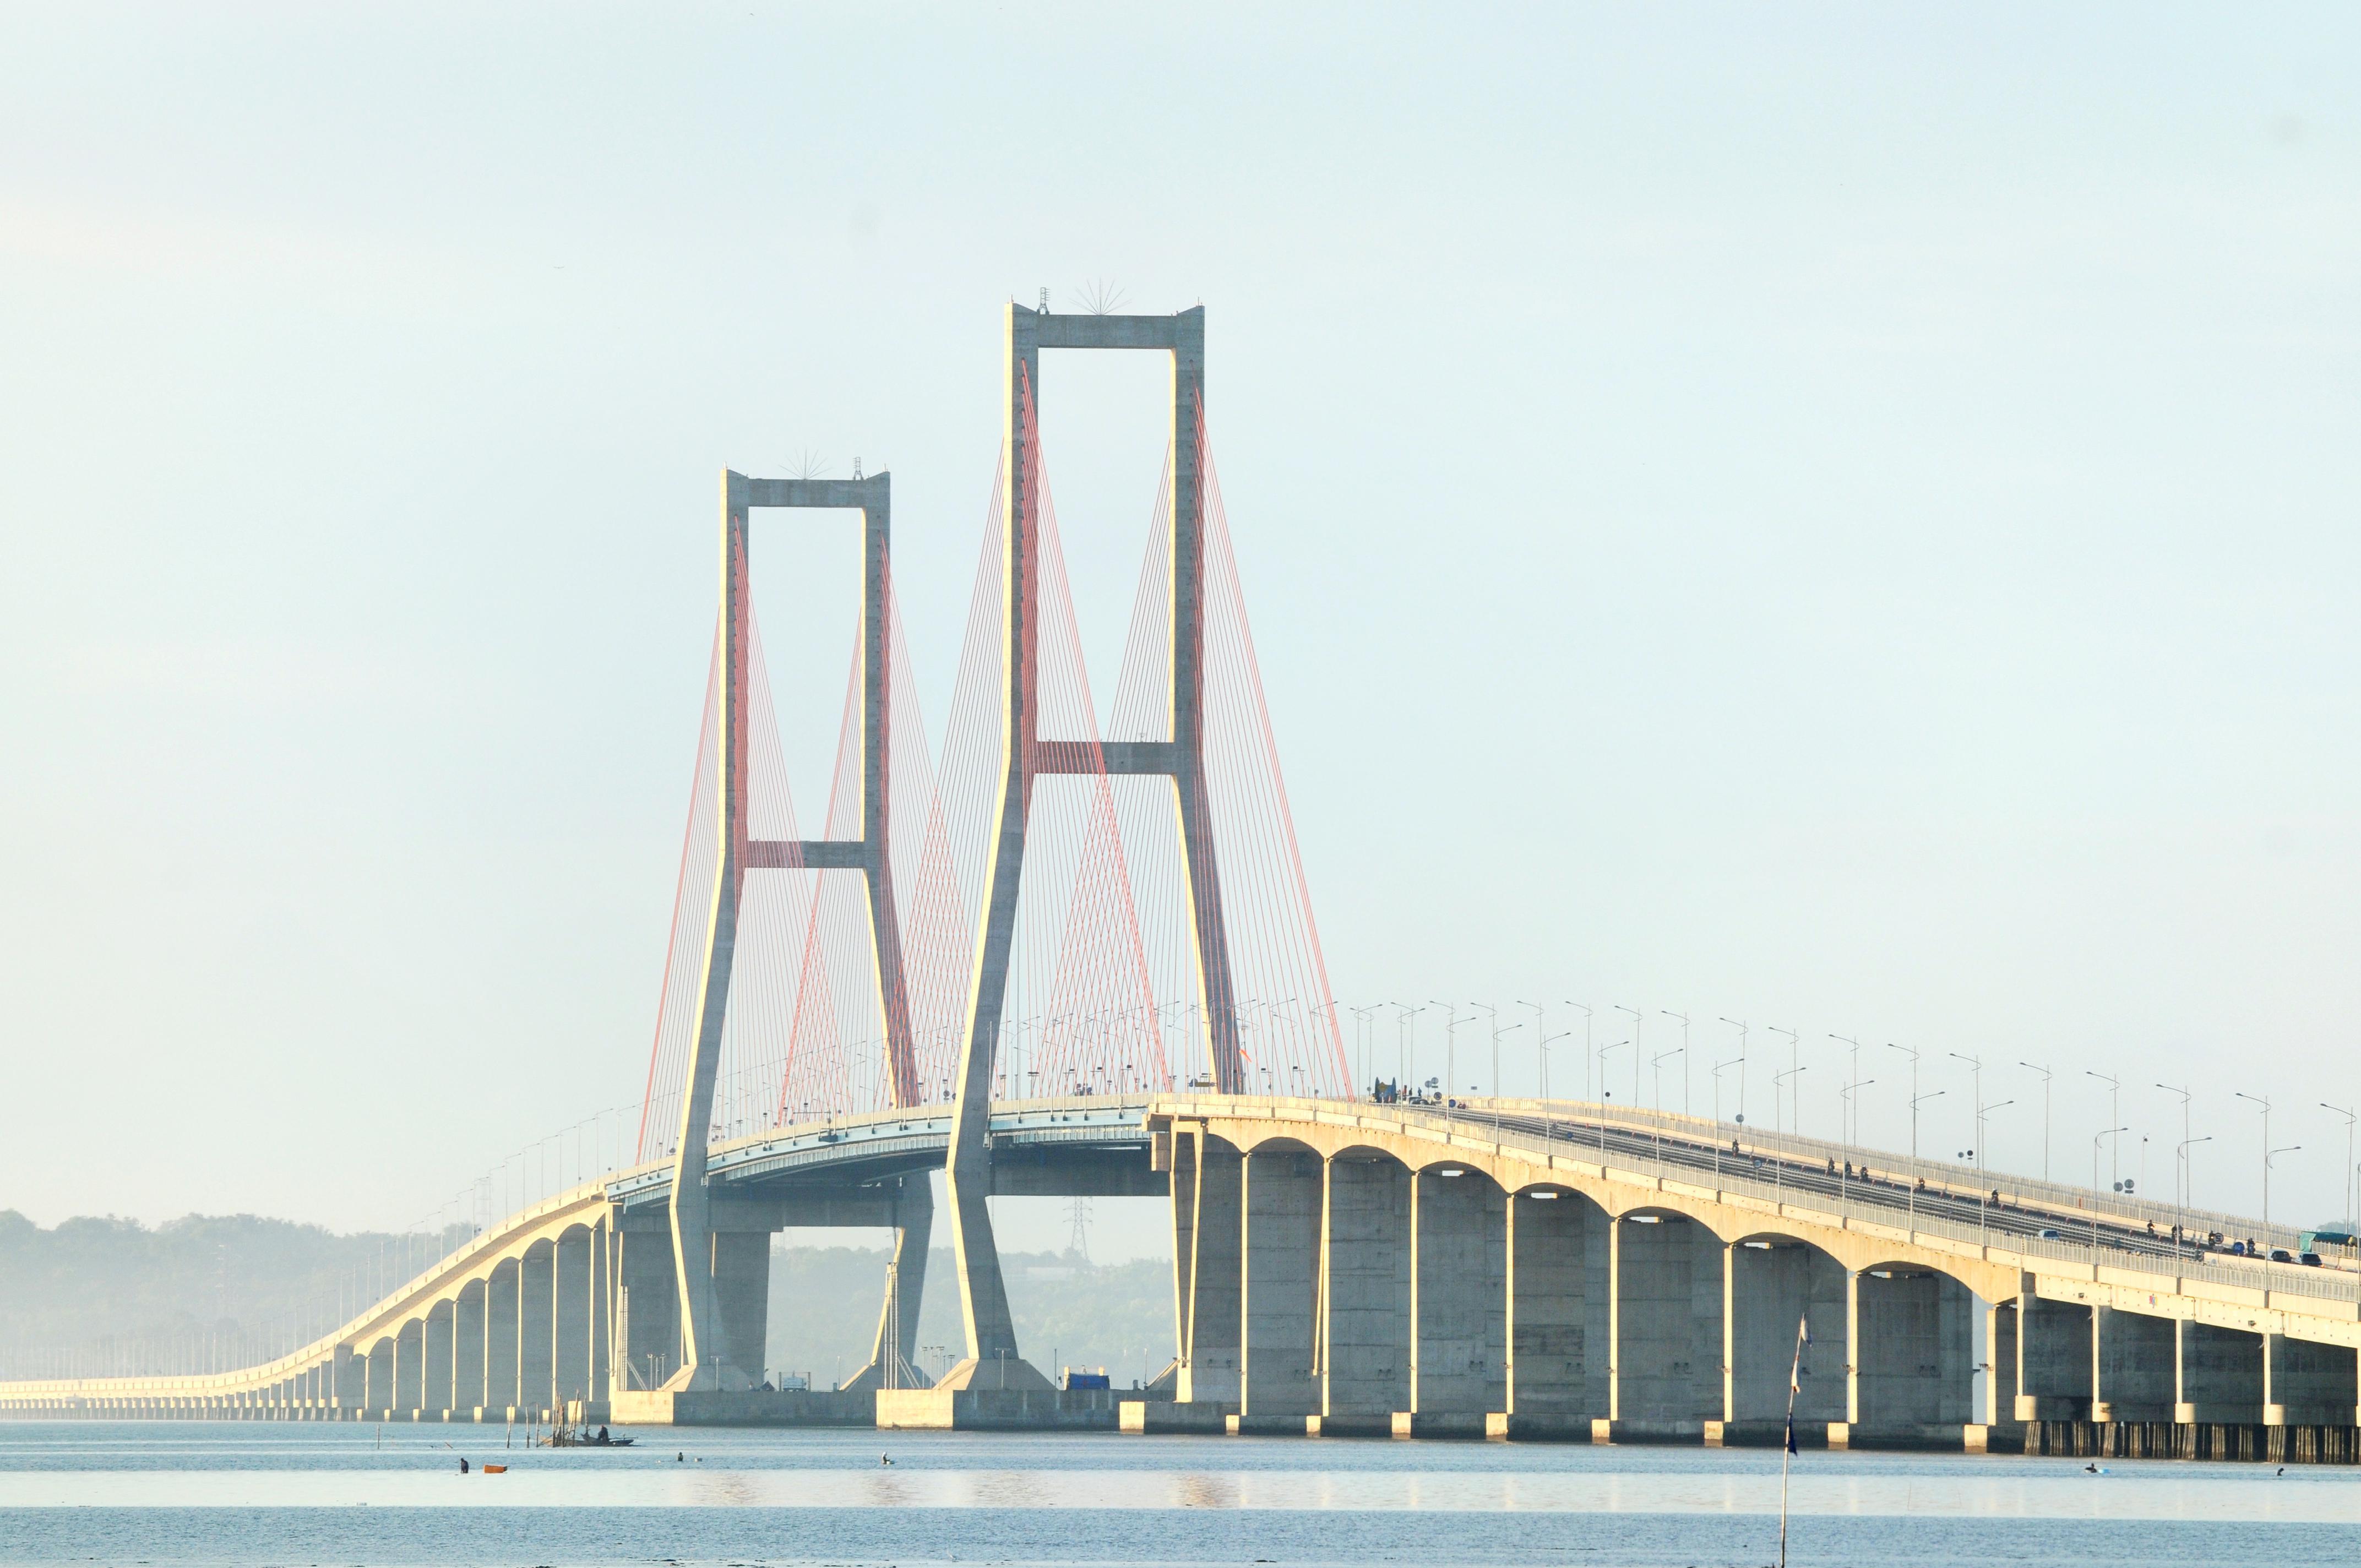 Suramadu National Bridge